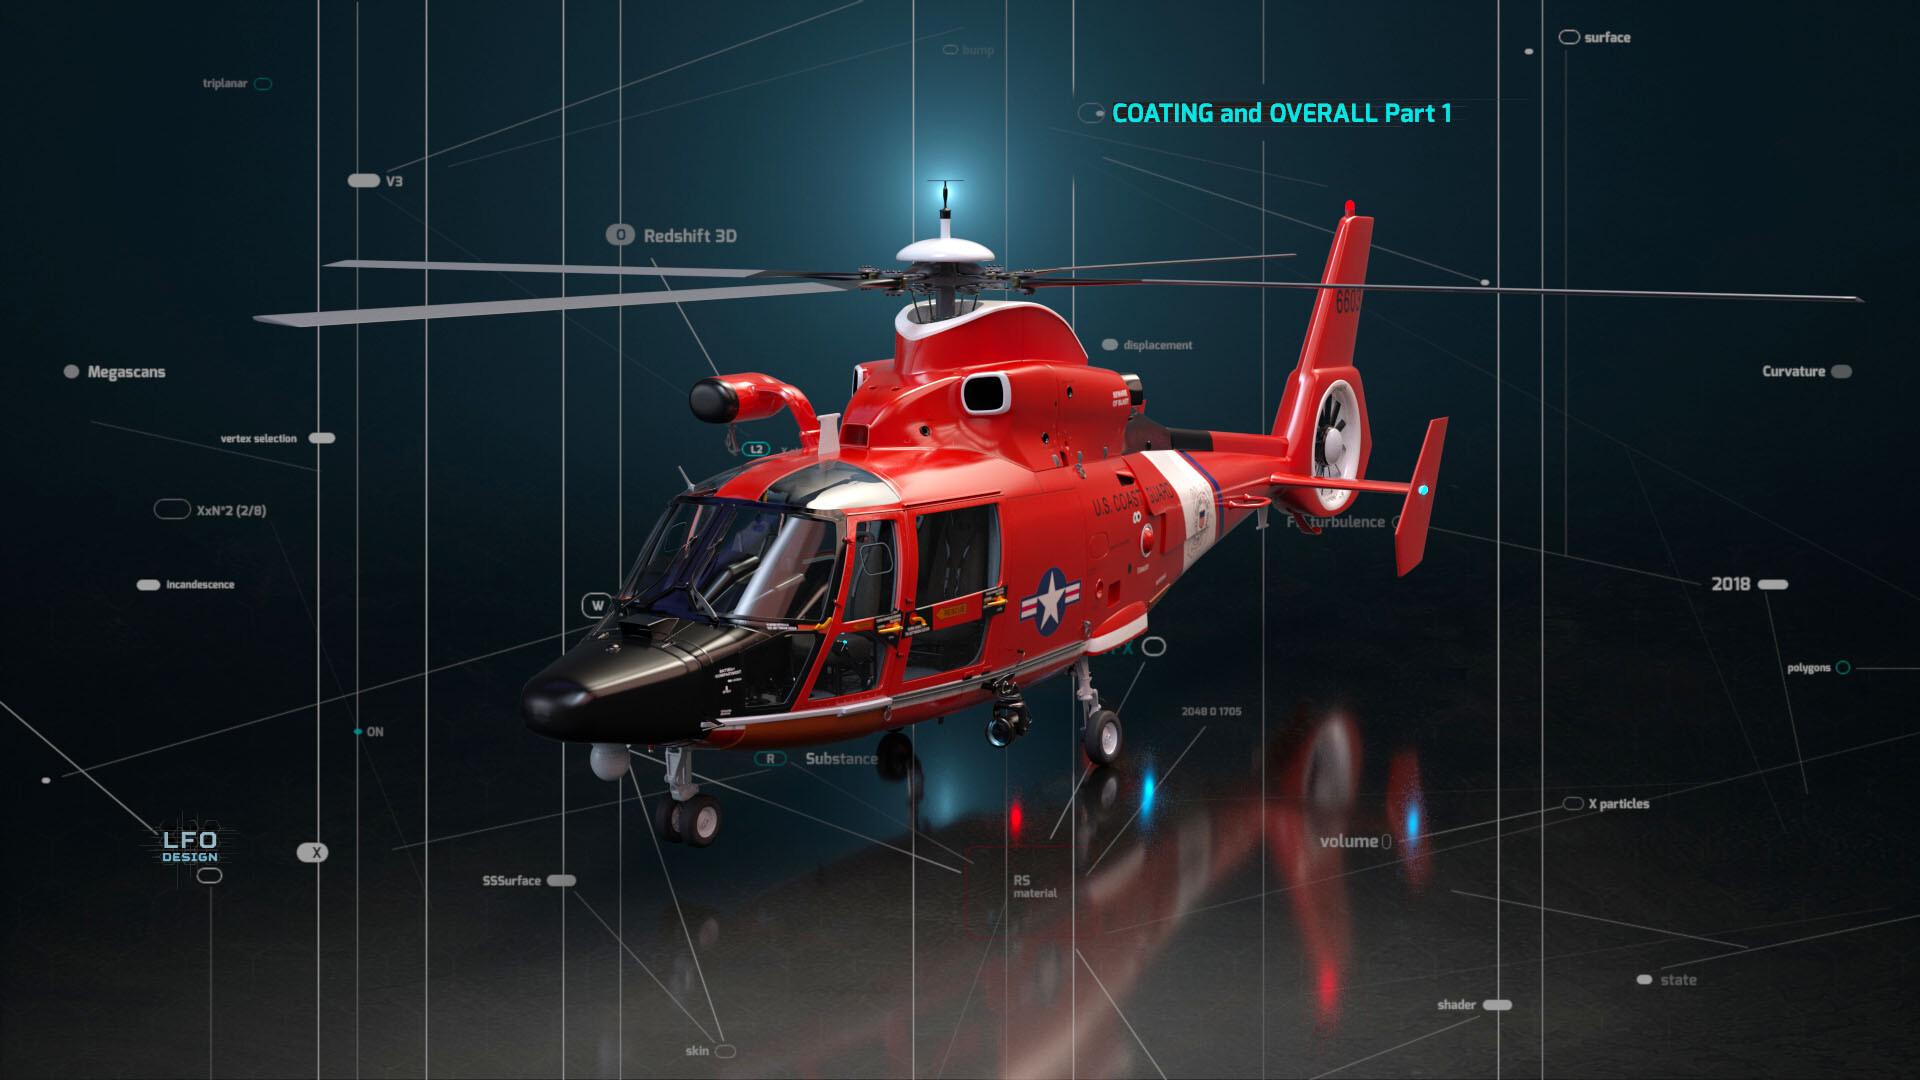 ArtStation - Redshift 3D Course, LFO Design